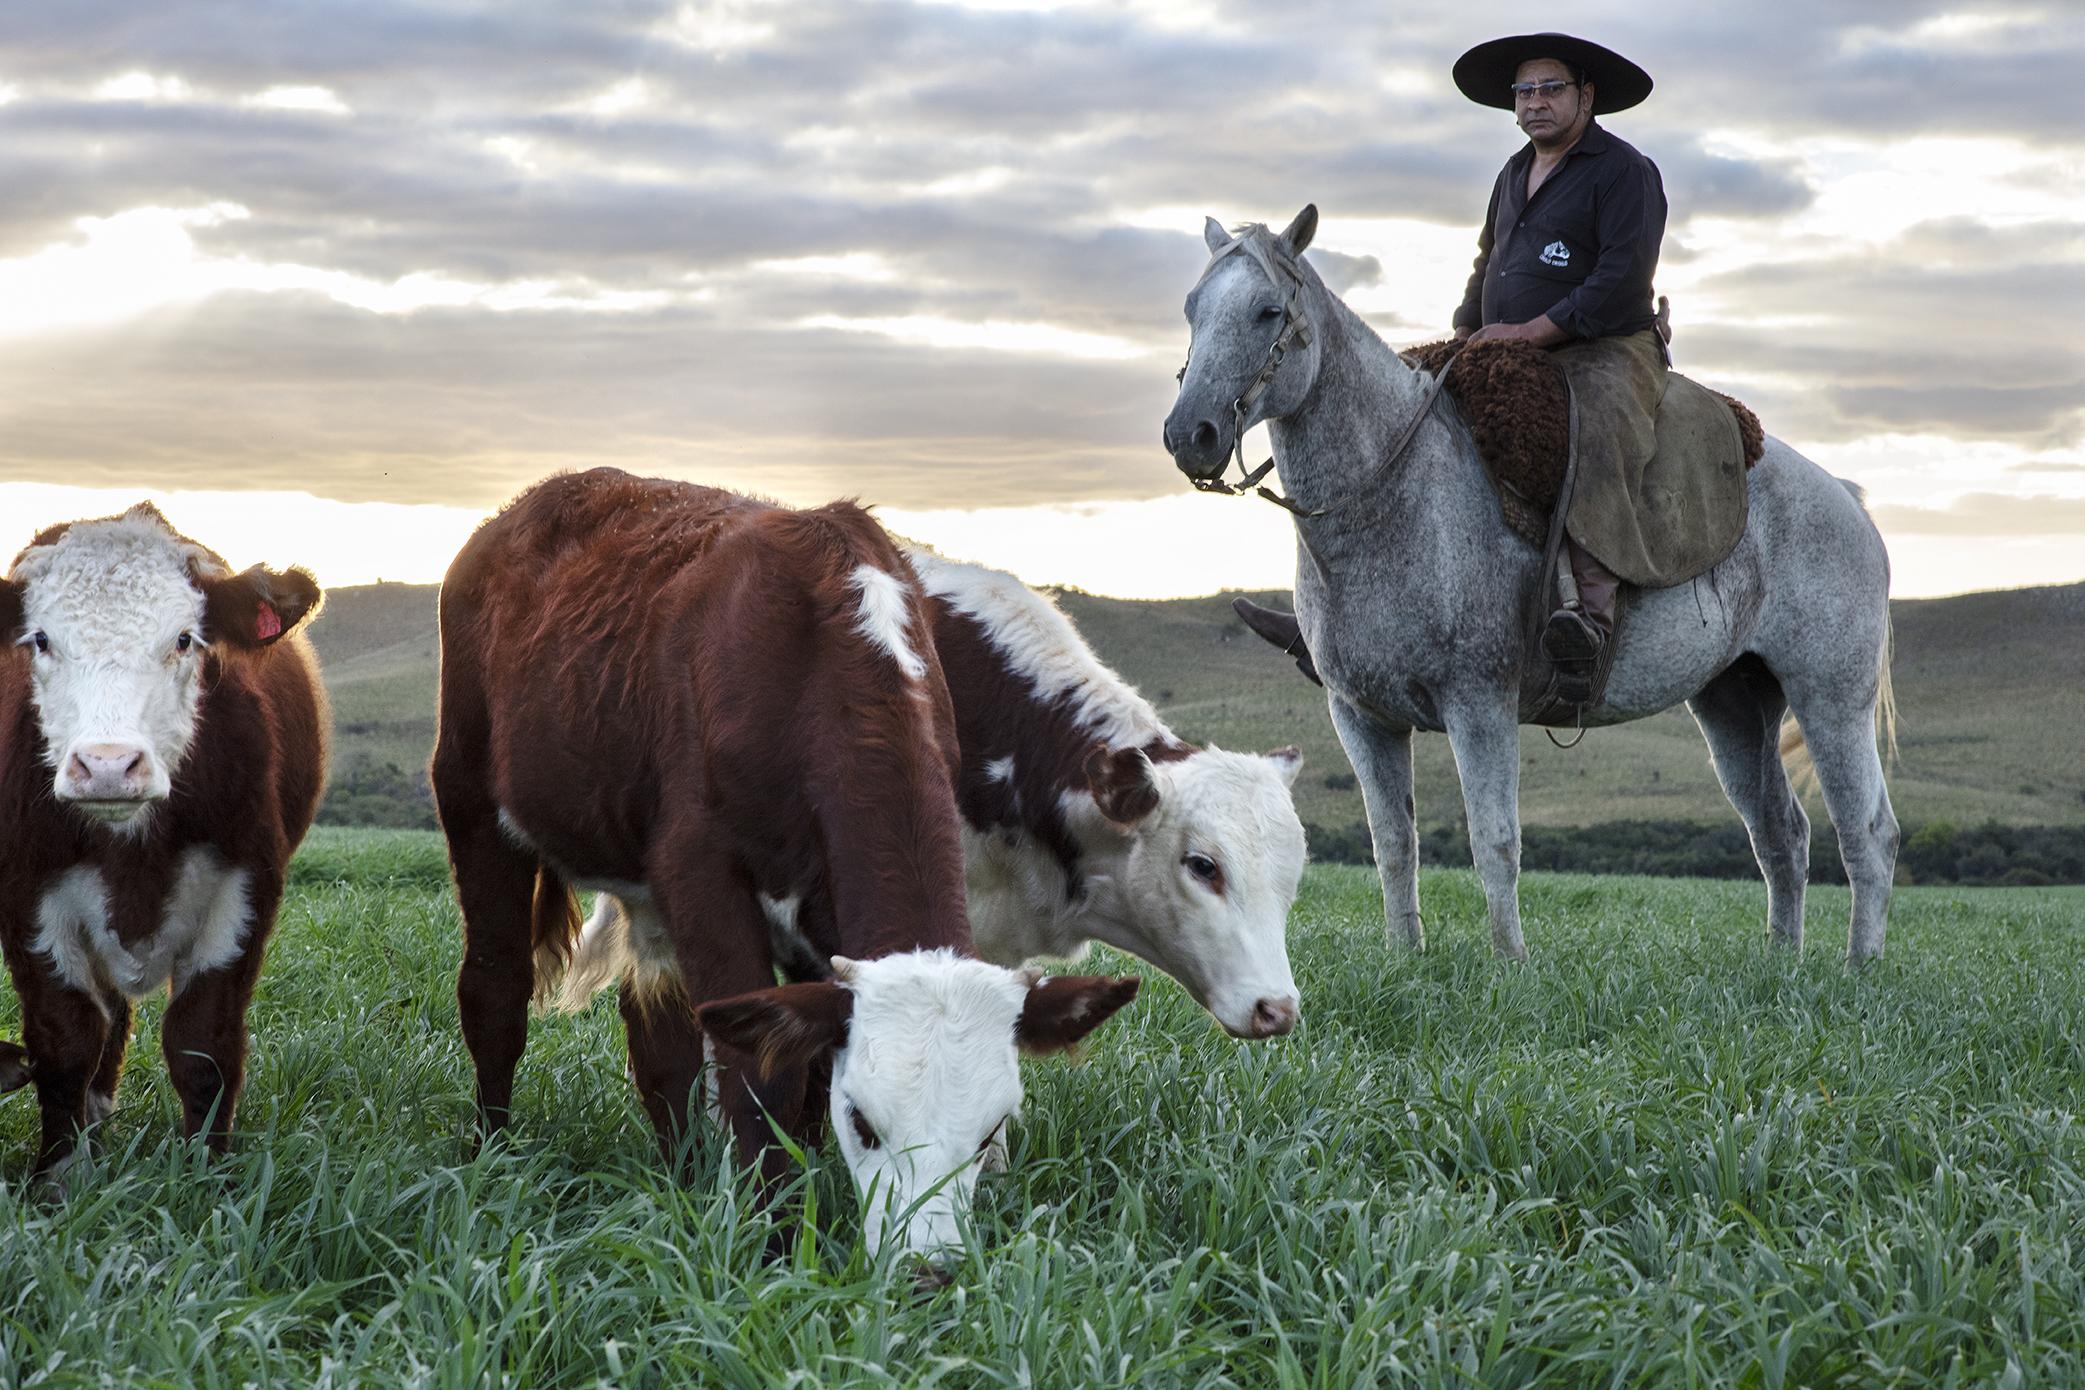 190417NH_brazil_maritza_farm_day1_2752.jpg